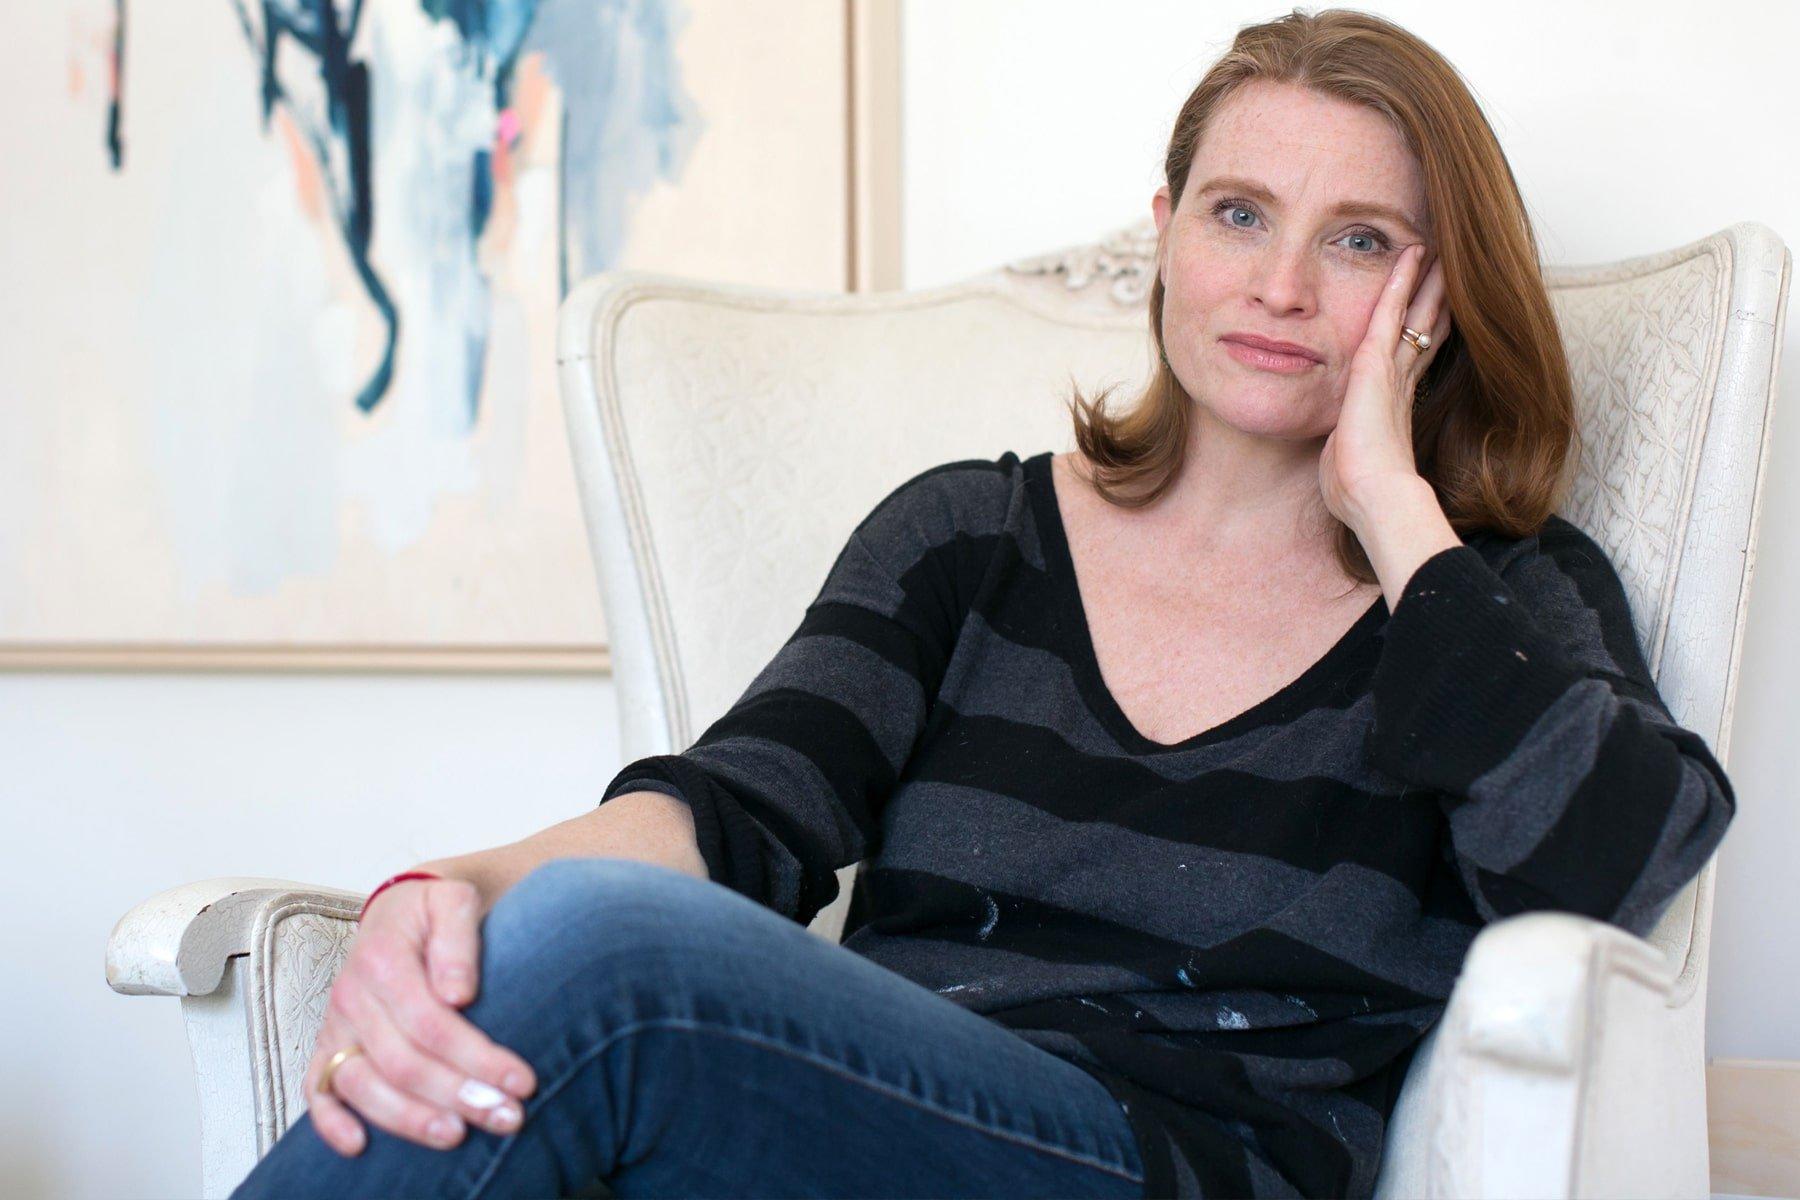 Johanna-Reynolds-client-of-Sara-Smeaton-Coaching-testimonial-landscape-c